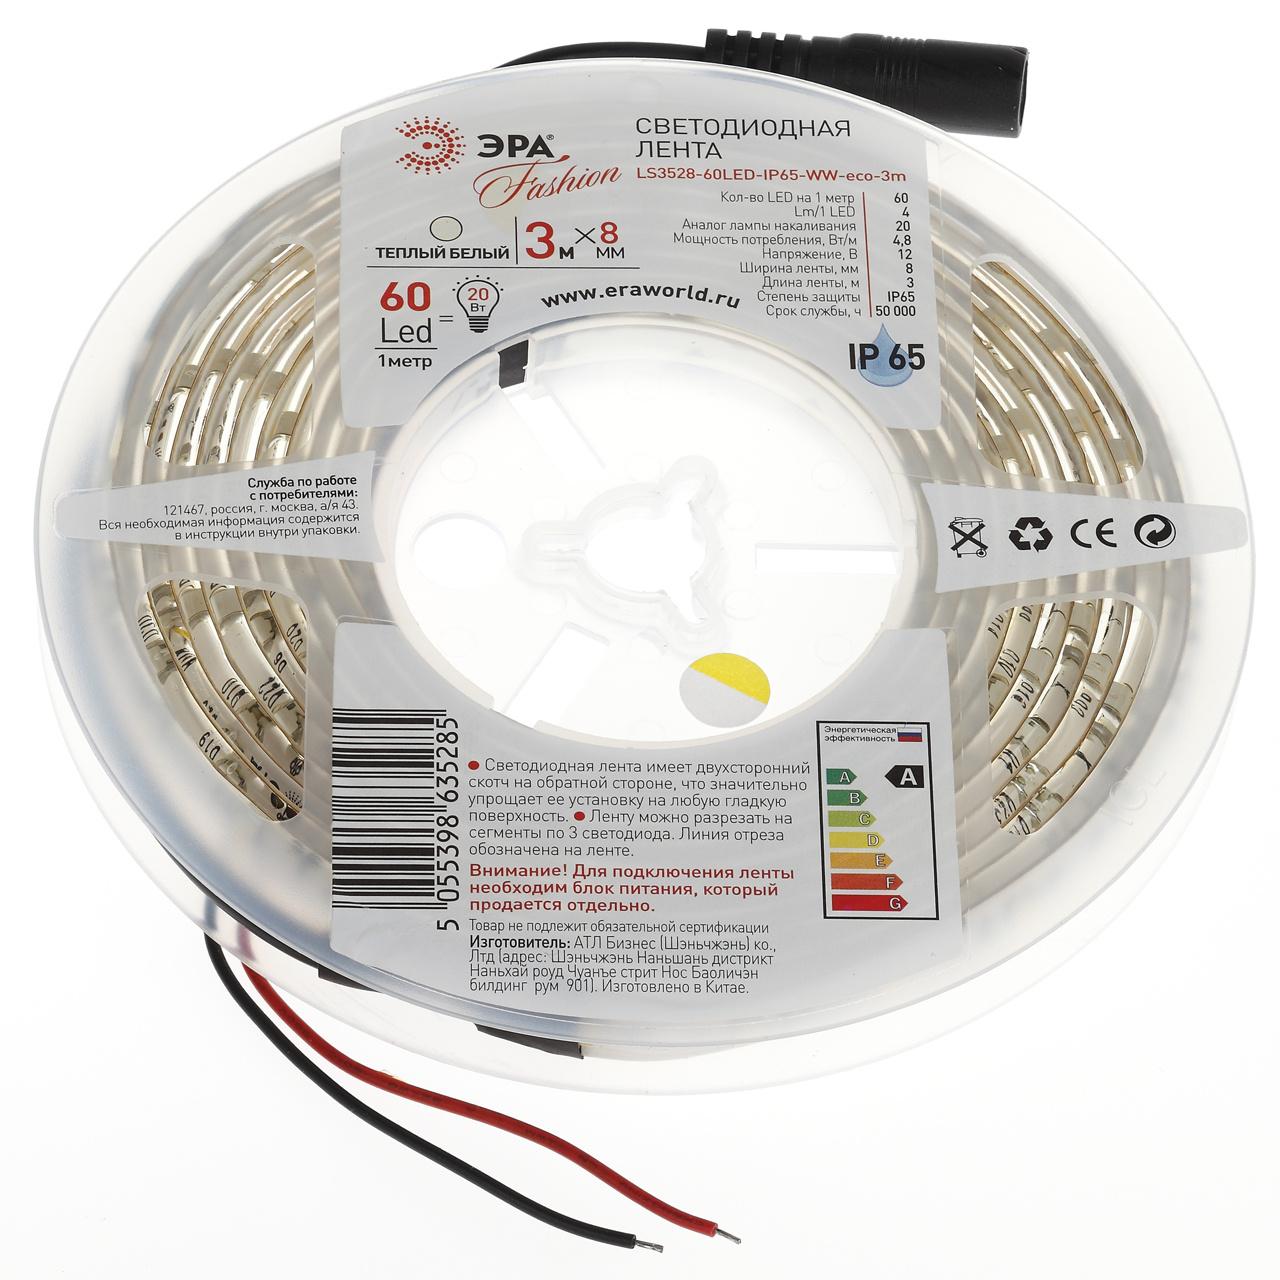 Светодиодная влагозащищенная лента ЭРА 4,8W/m 60LED/m 3528SMD теплый белый 3M LS3528-60LED-IP65-WW-eco-3m